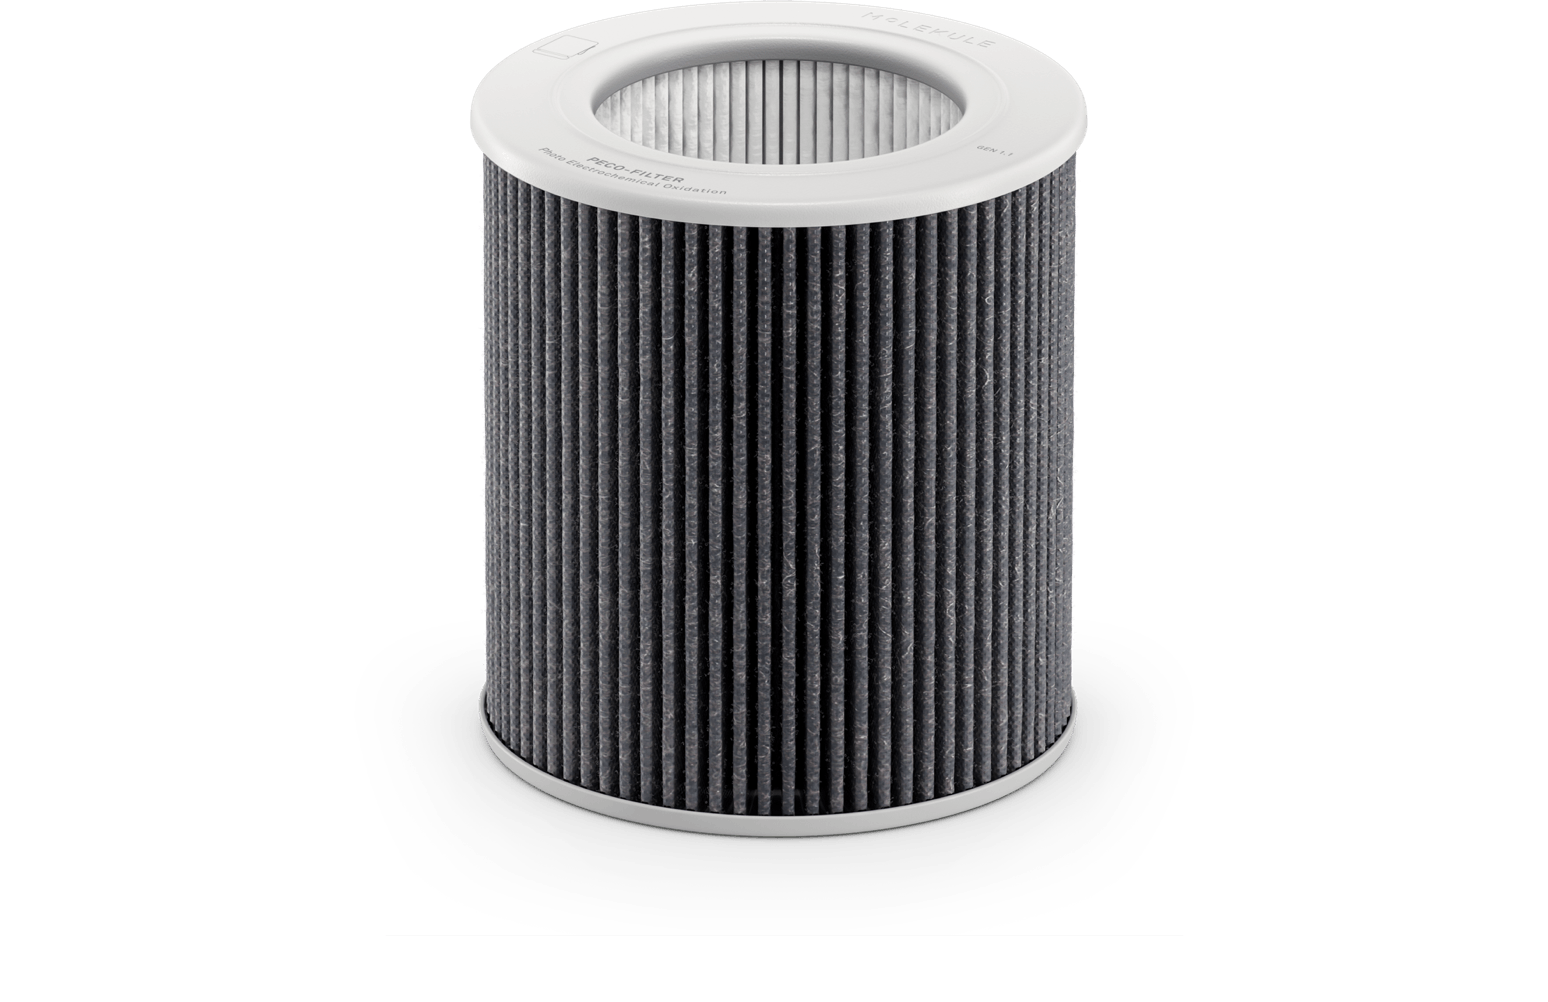 PECO Filter White for Molekule Air Purifier